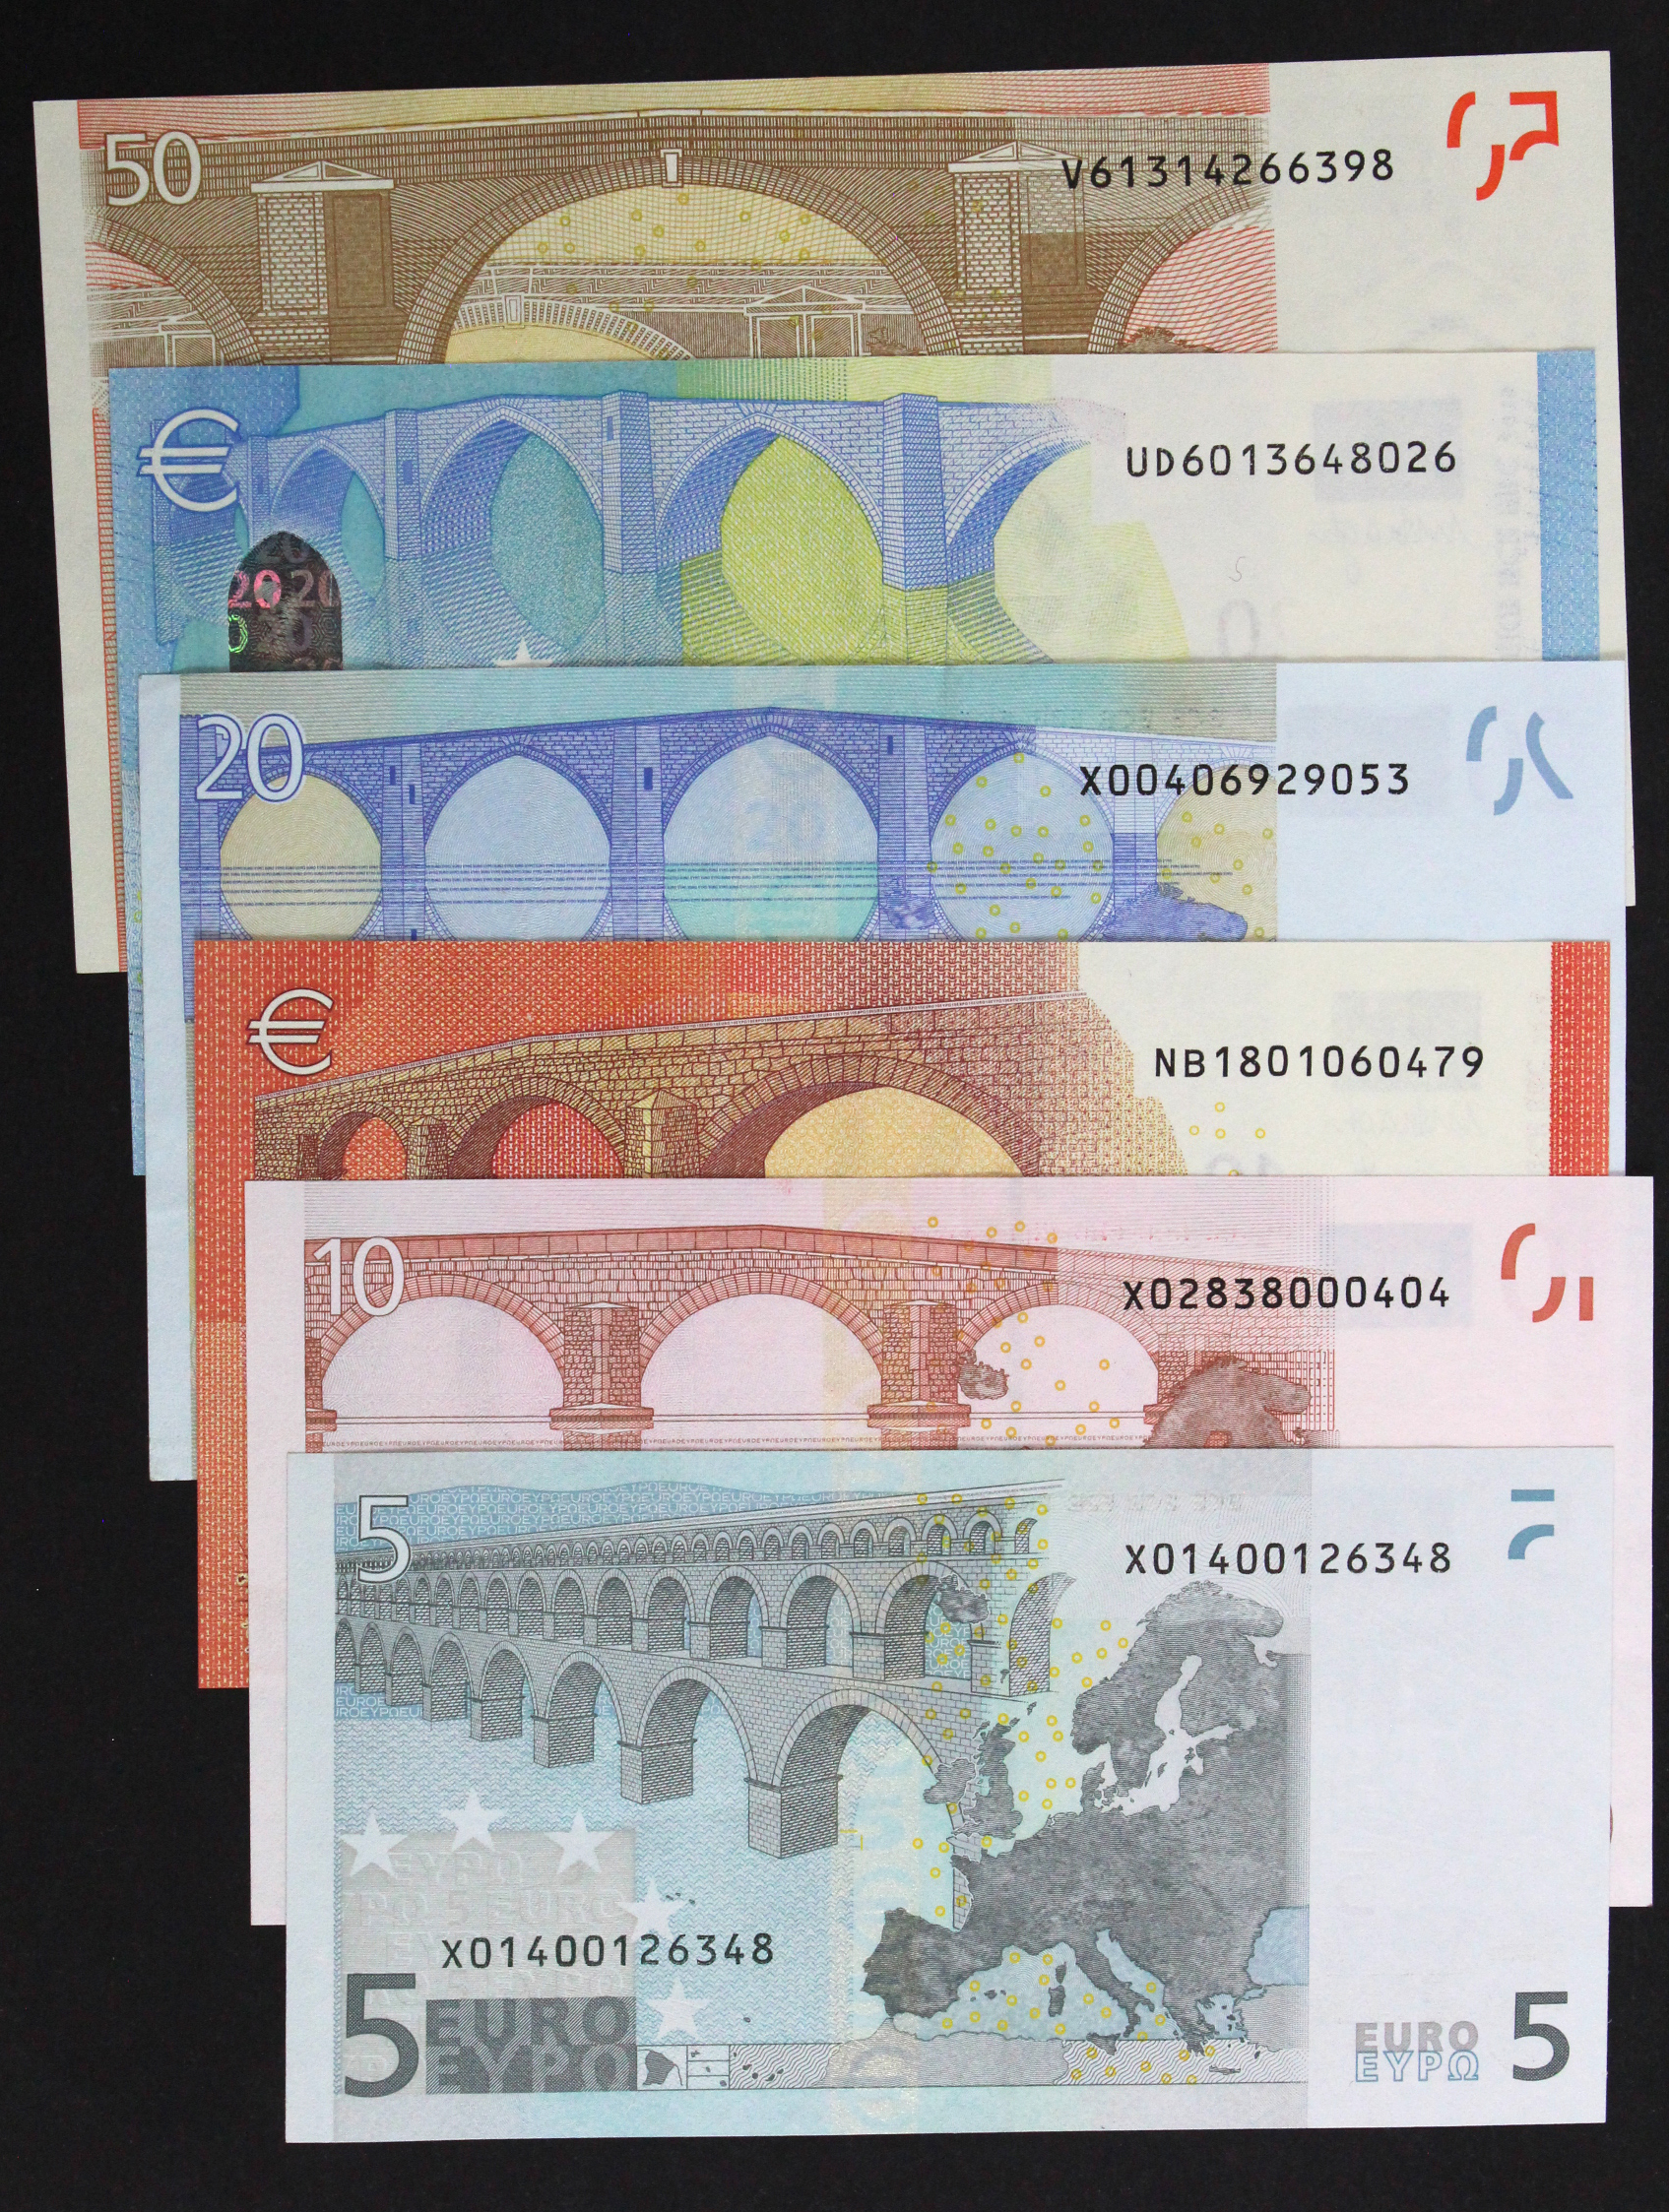 European Union (6), 50 Euro dated 2002, 20 Euro dated 2002 & 2015, 10 Euro dated 2002 & 2014, 5 Euro - Image 2 of 2